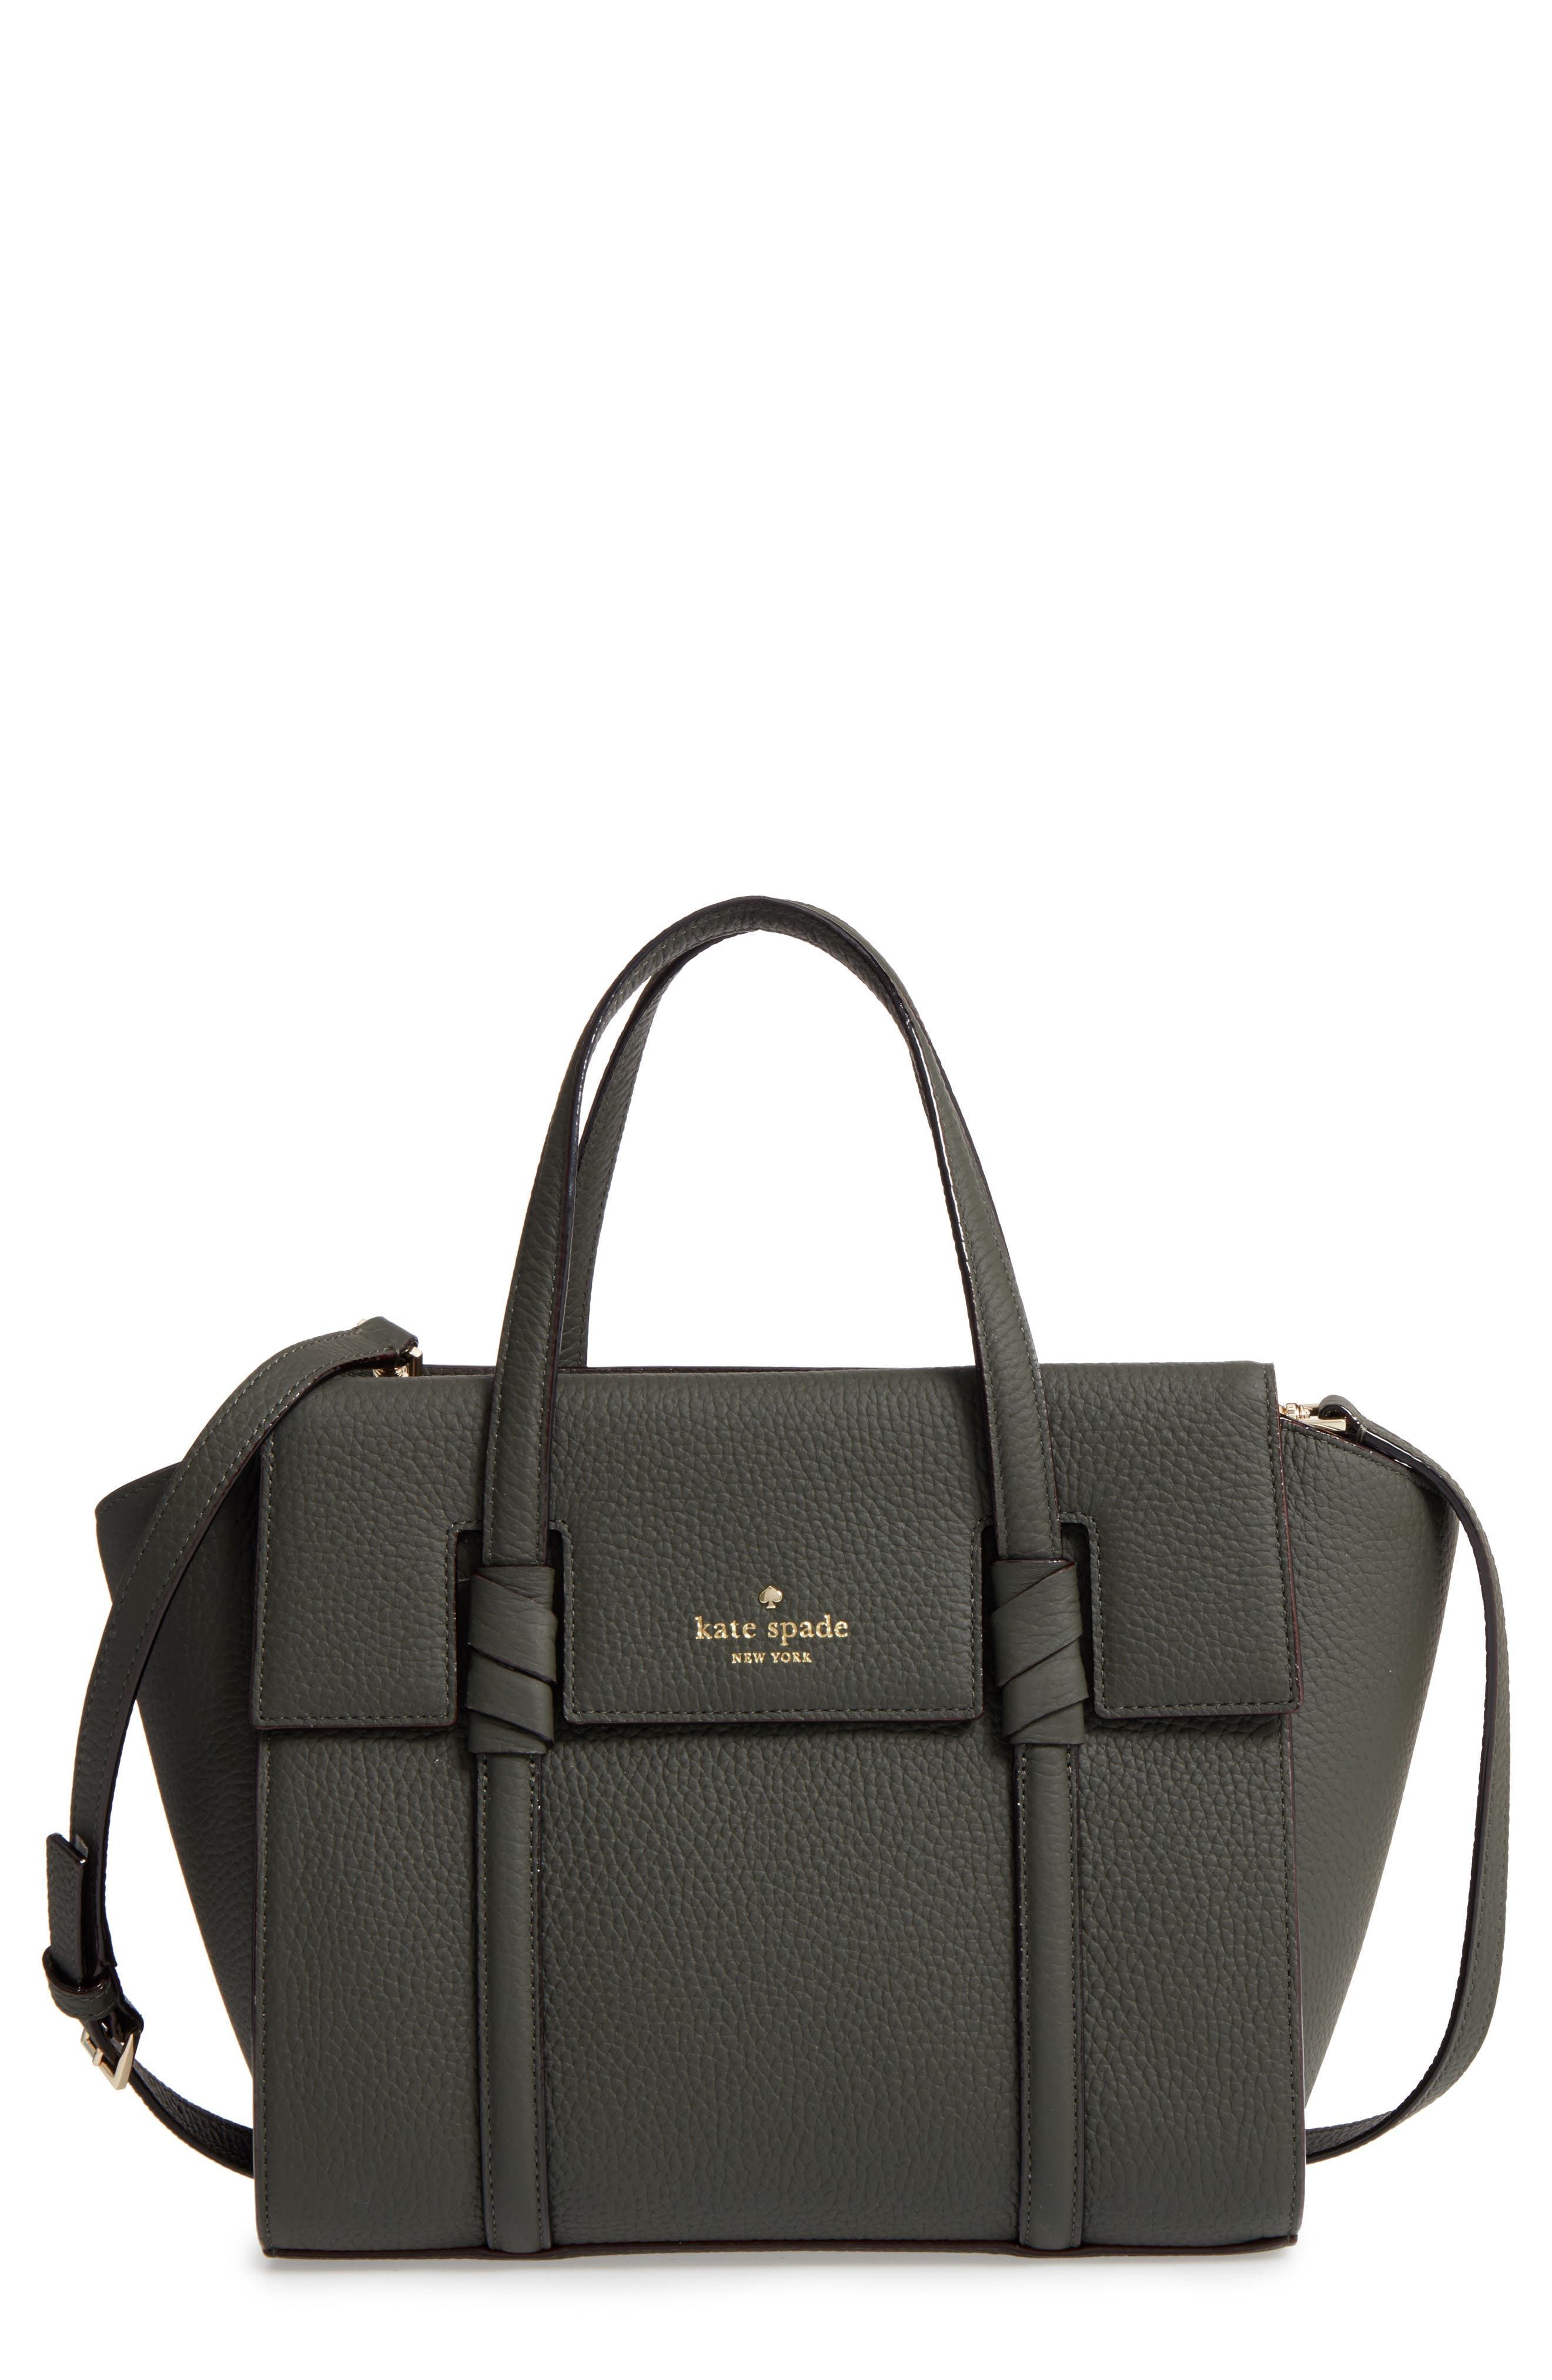 KATE SPADE NEW YORK daniels drive – small abigail satchel